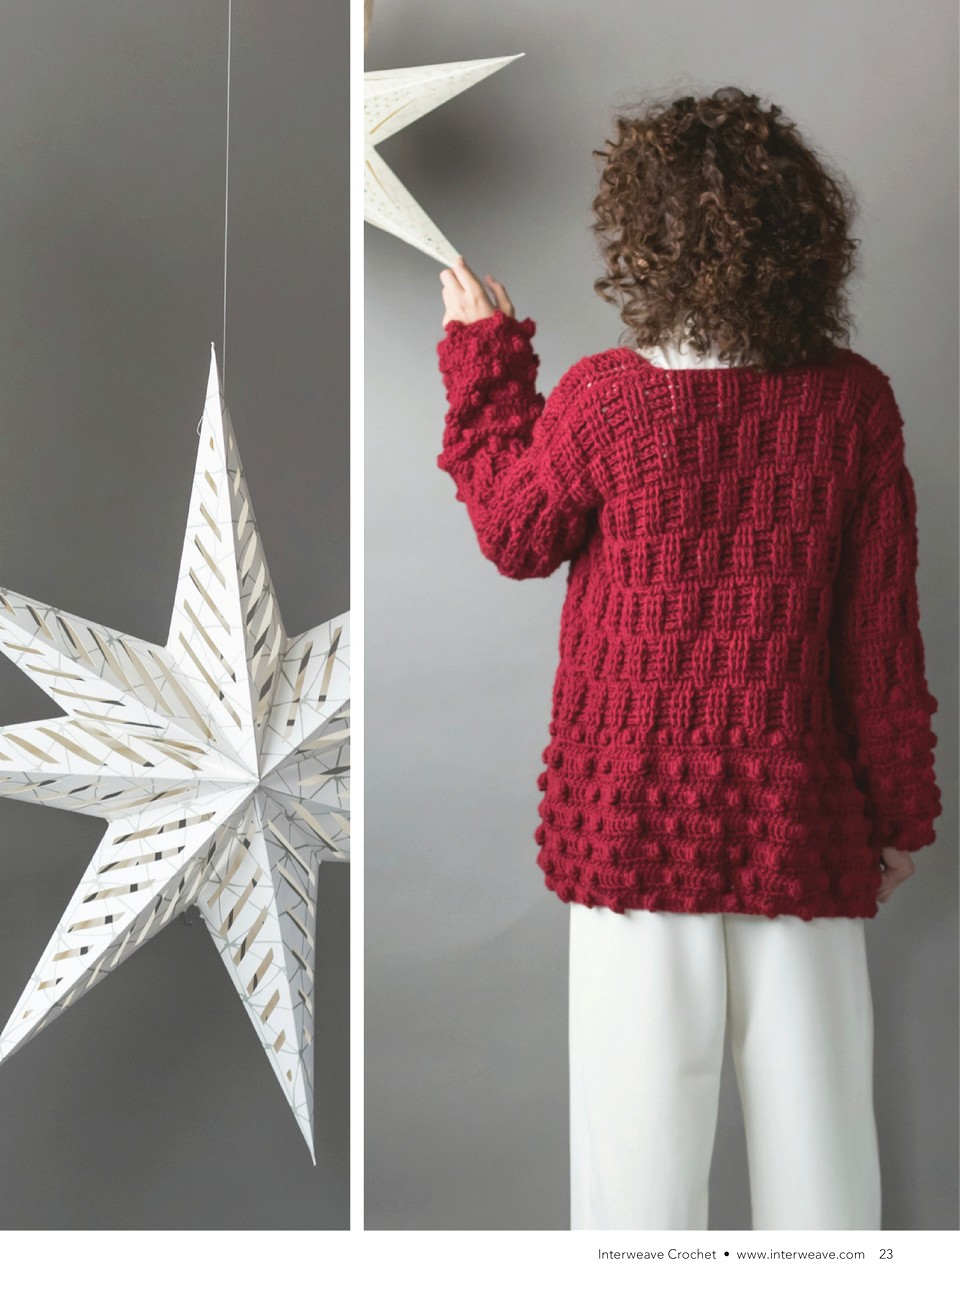 Interweave Crochet Winter 2019-24